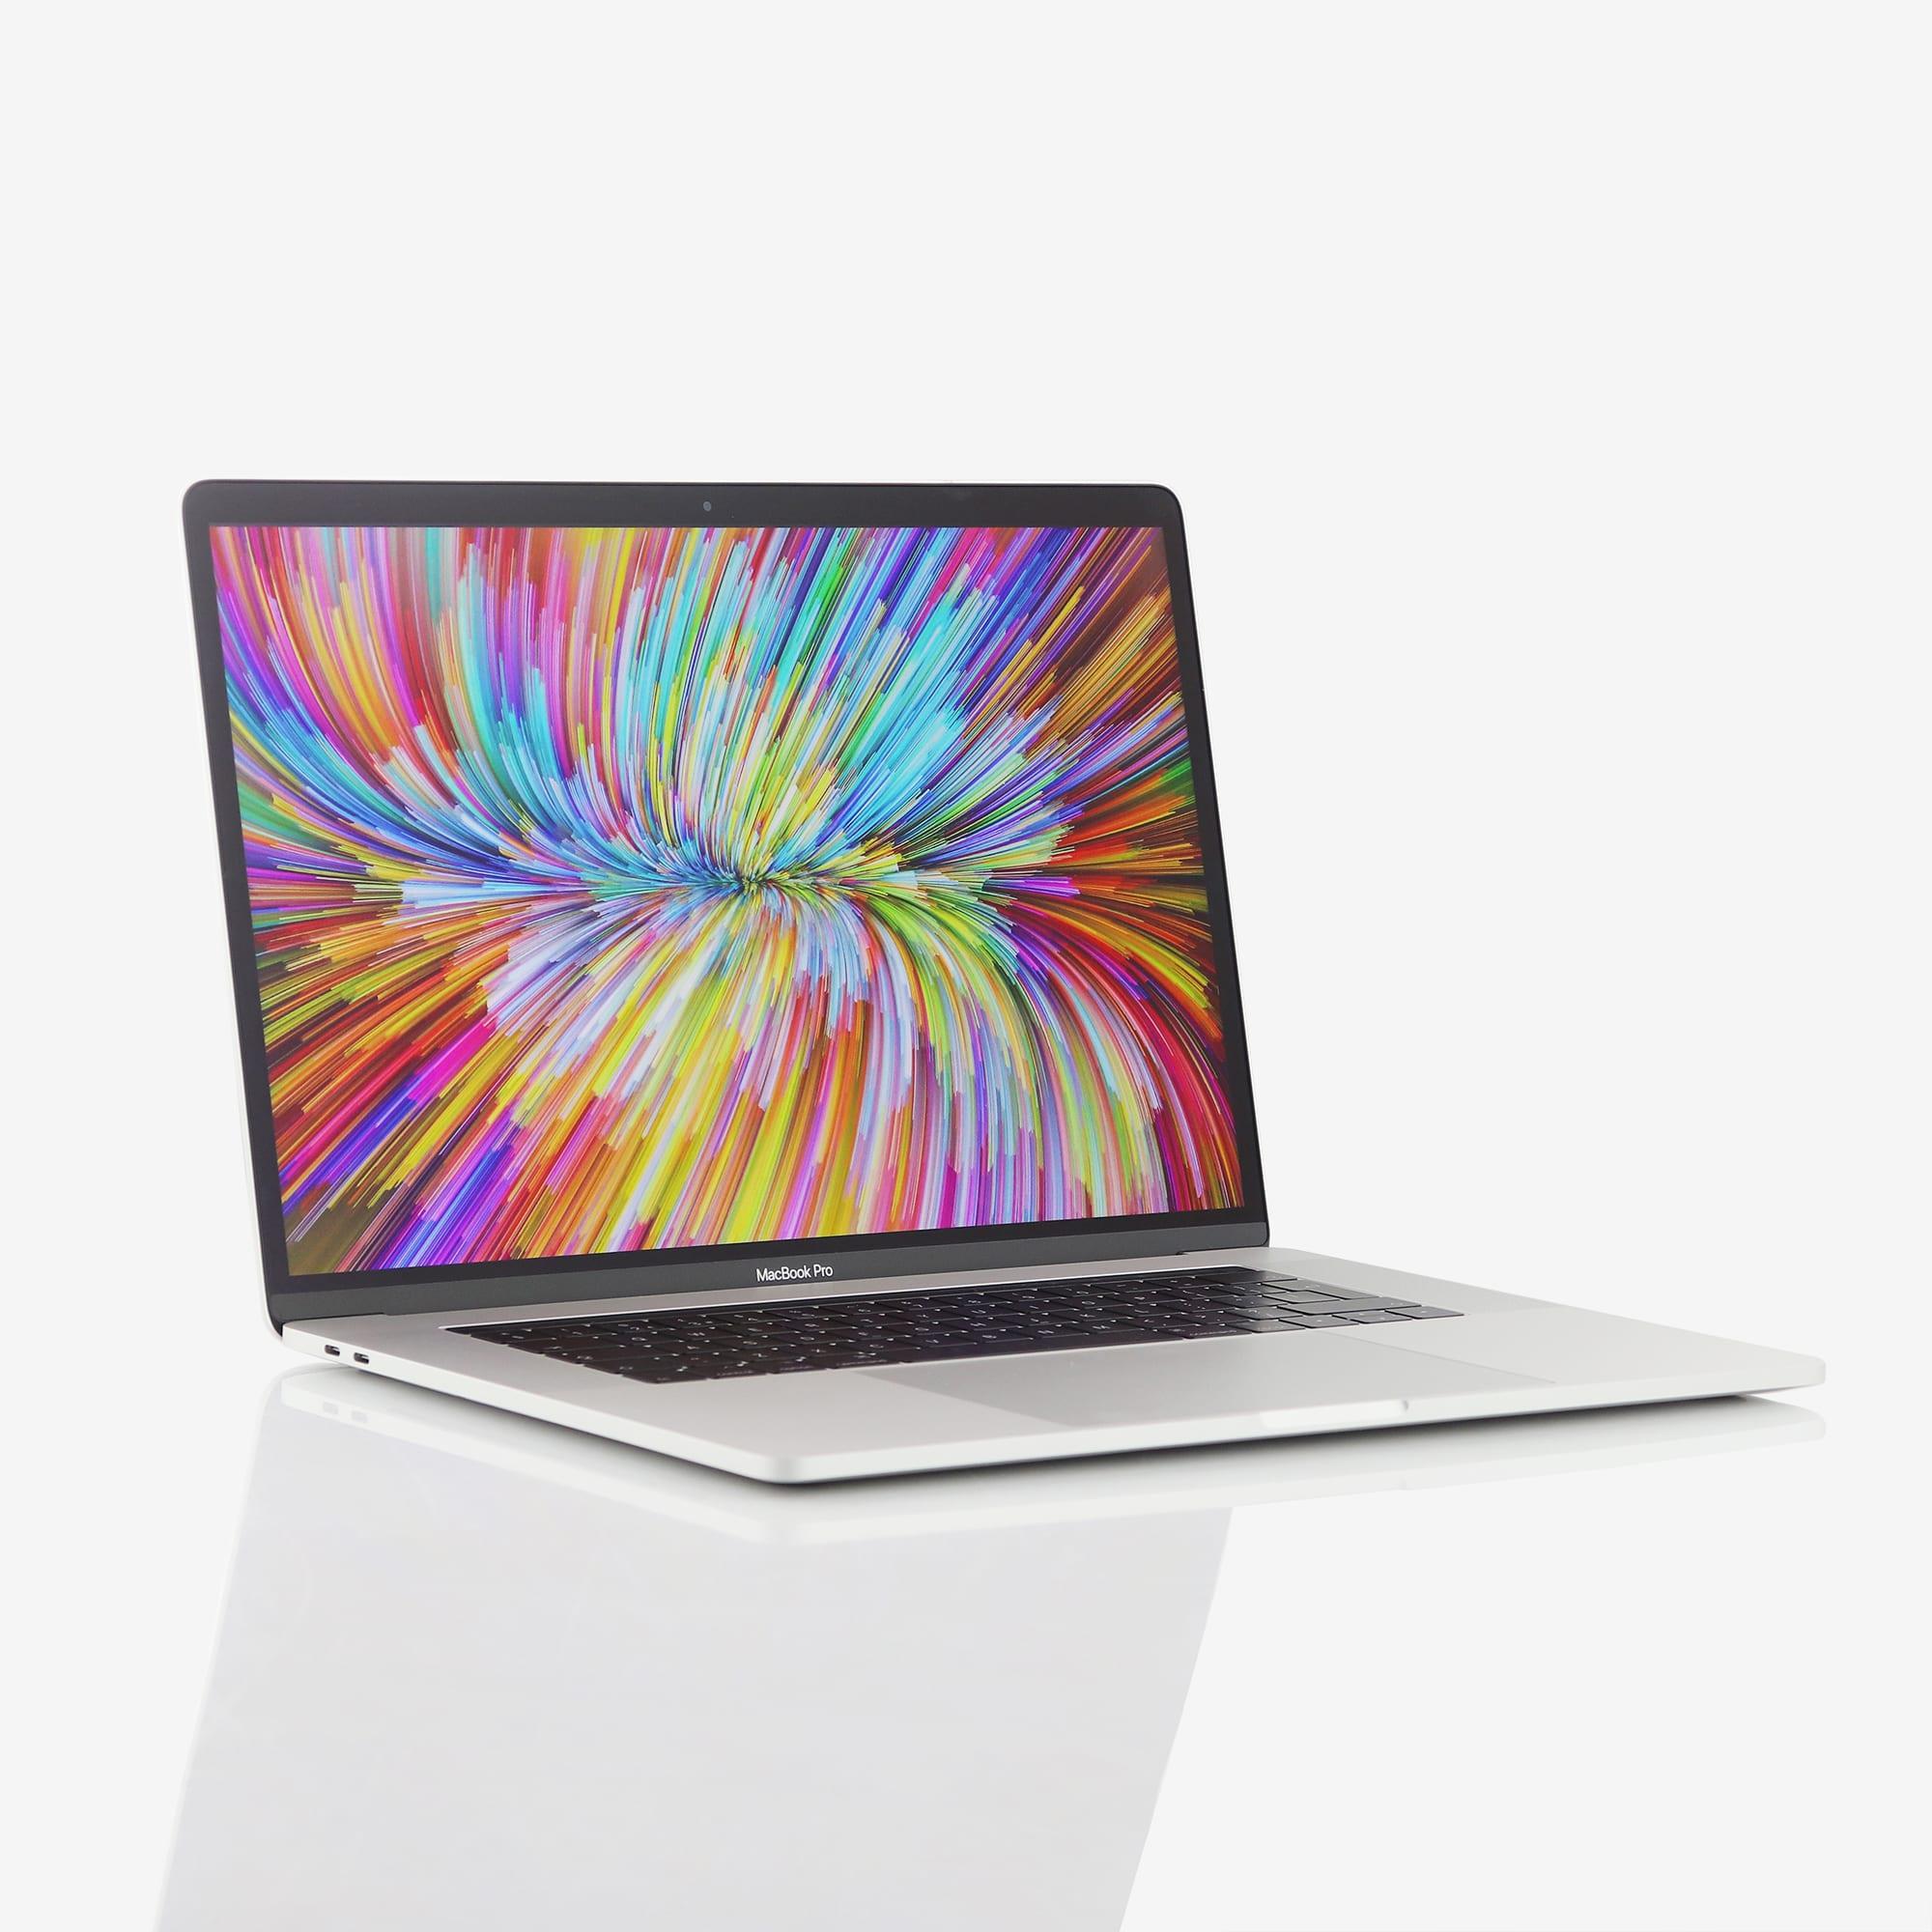 1 x Apple MacBook Pro Retina 15 Inch Quad-Core i7 2.90 GHz (2016)